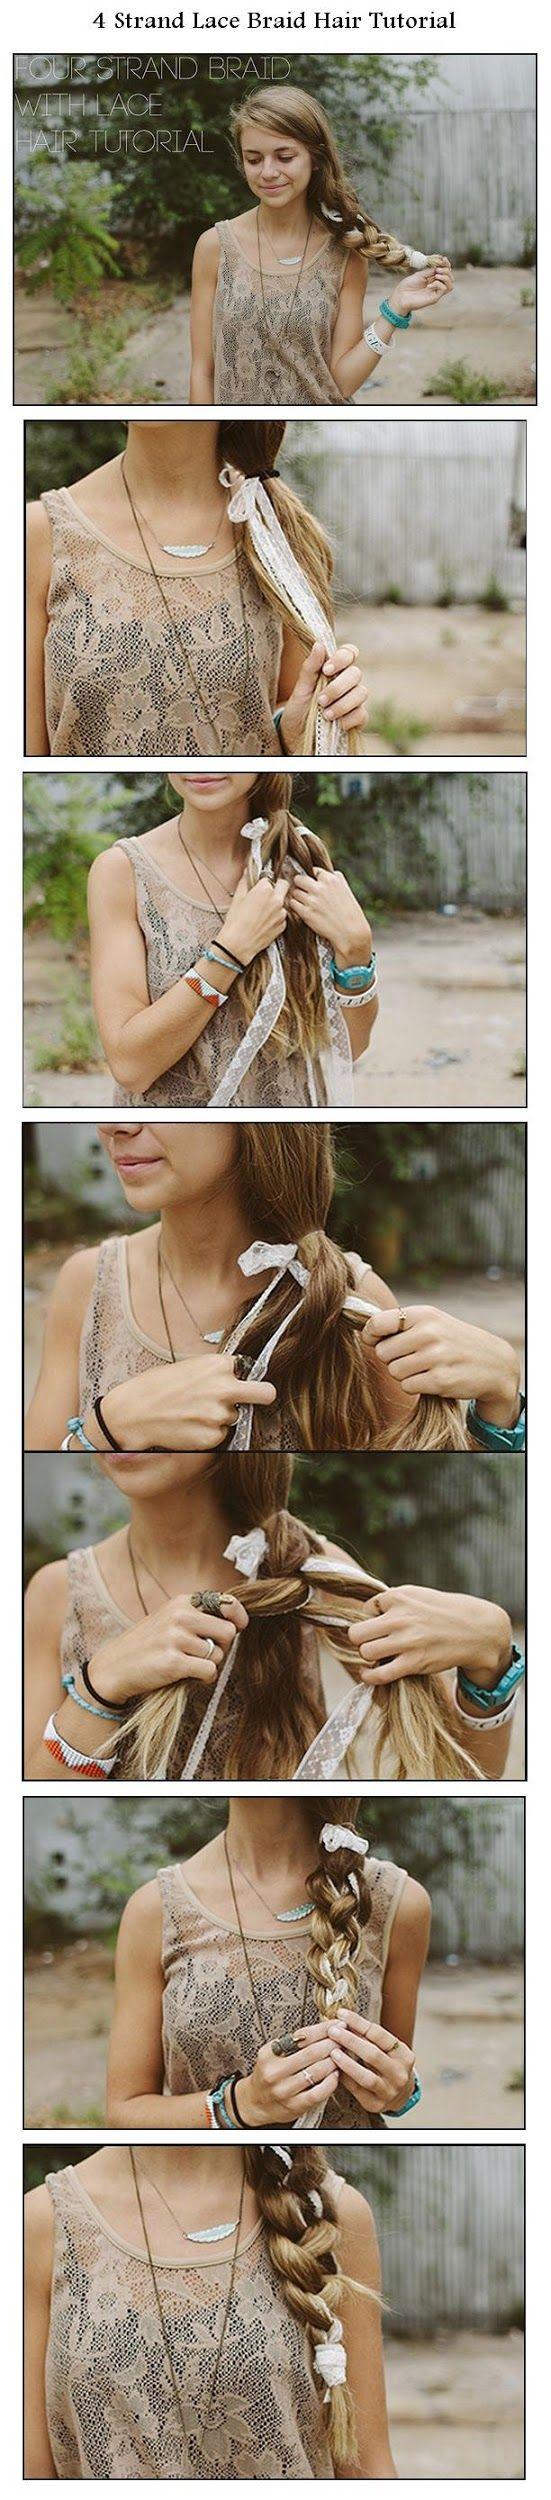 4 Strand Lace Braid Hair Tutorial   hairstyles tutorial